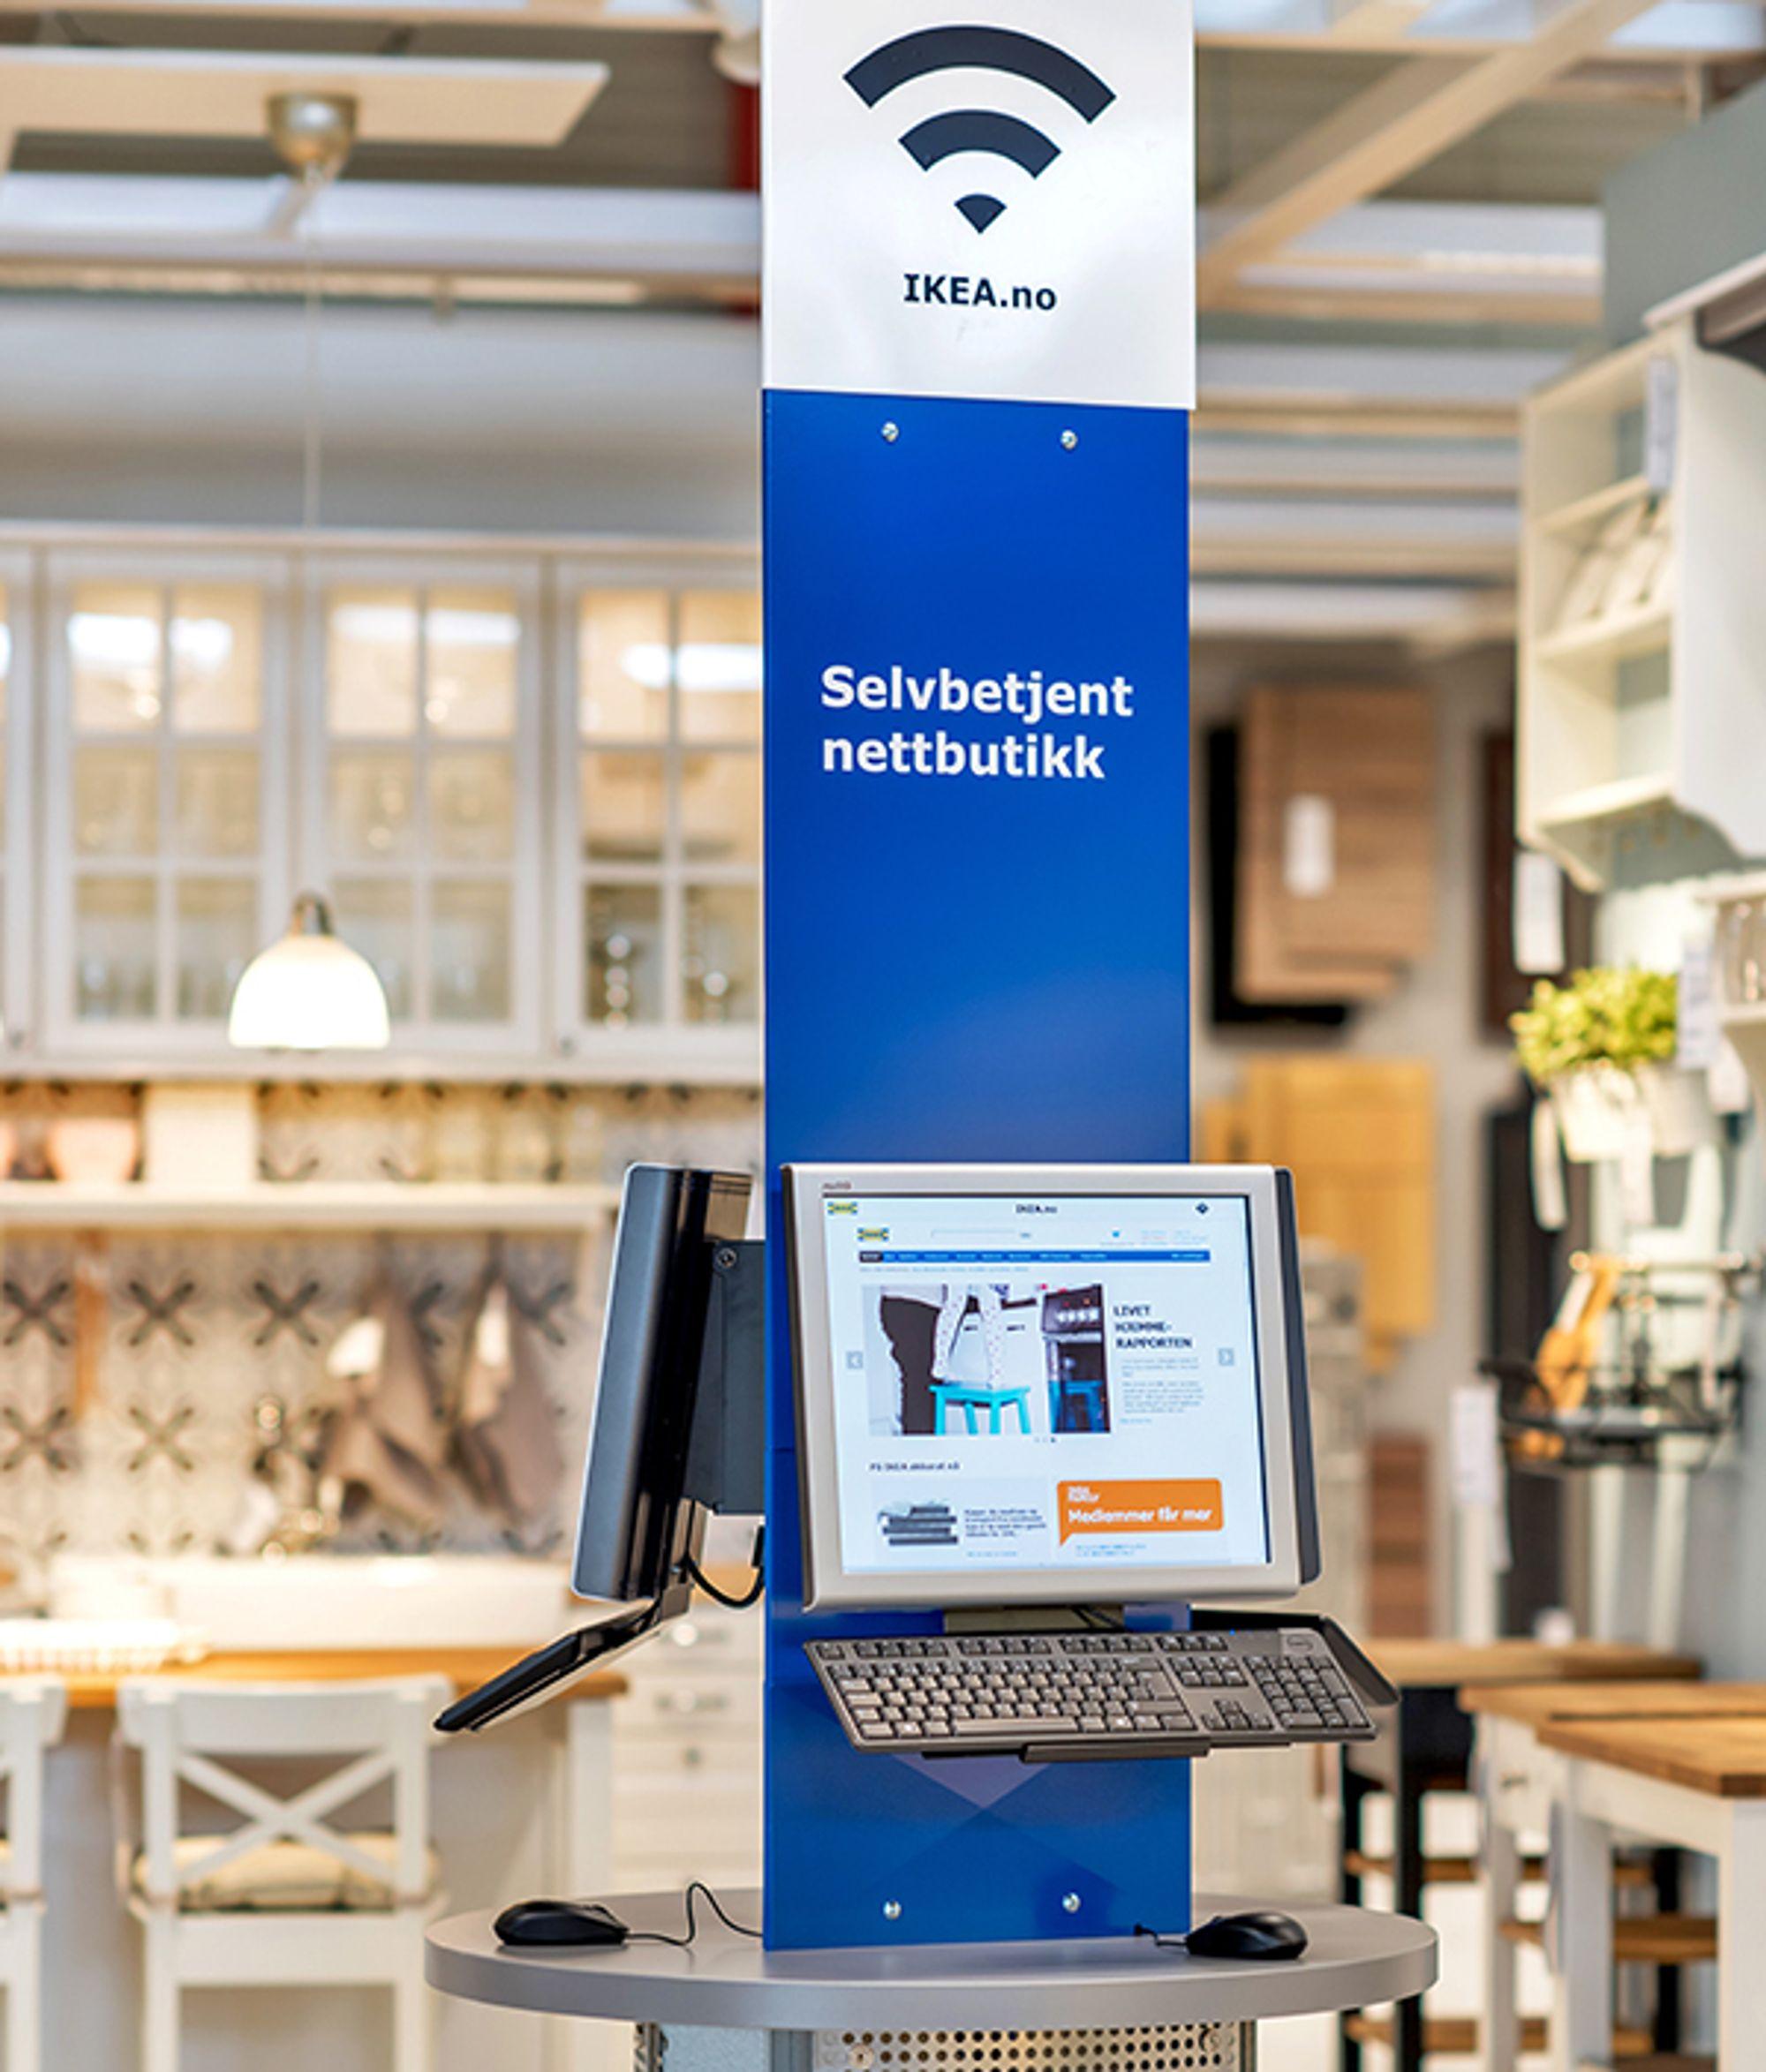 Service Amp Kontakt Ikea Finanzprodukte - vinpearl-baidai.info